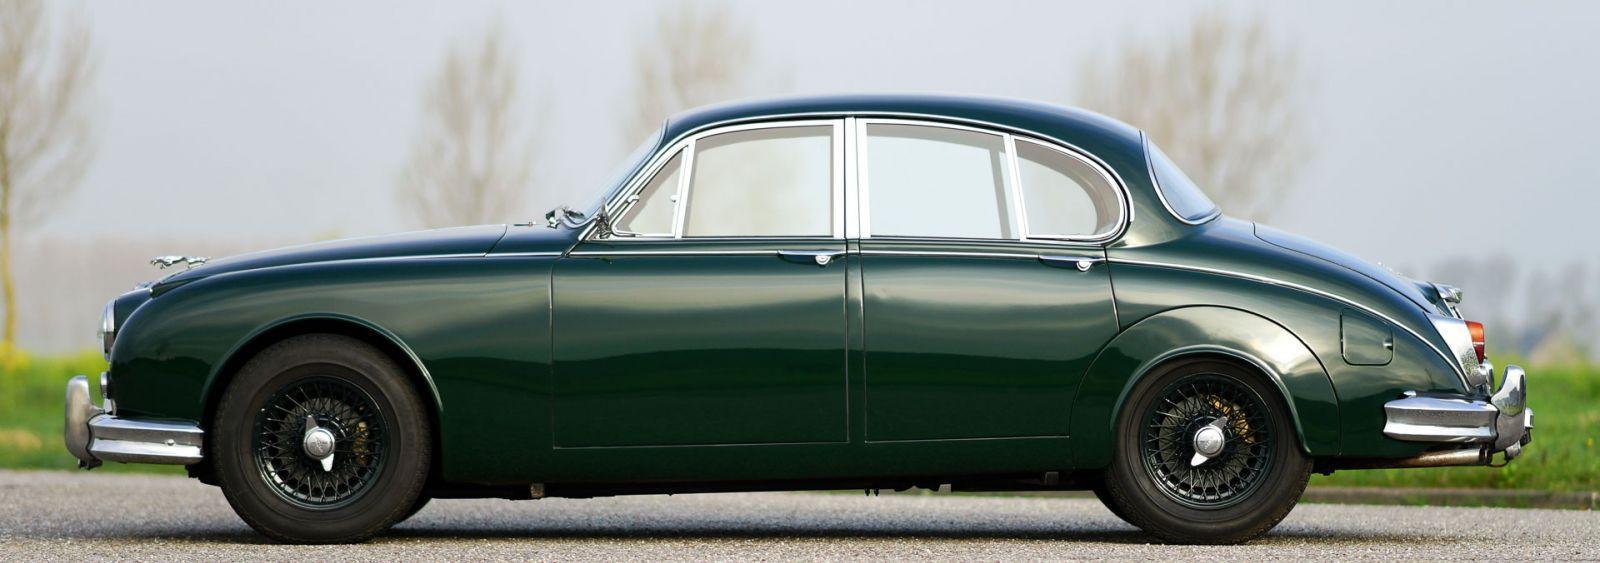 Pin By John Maccarone On Cars Vehicles Jaguar Cars